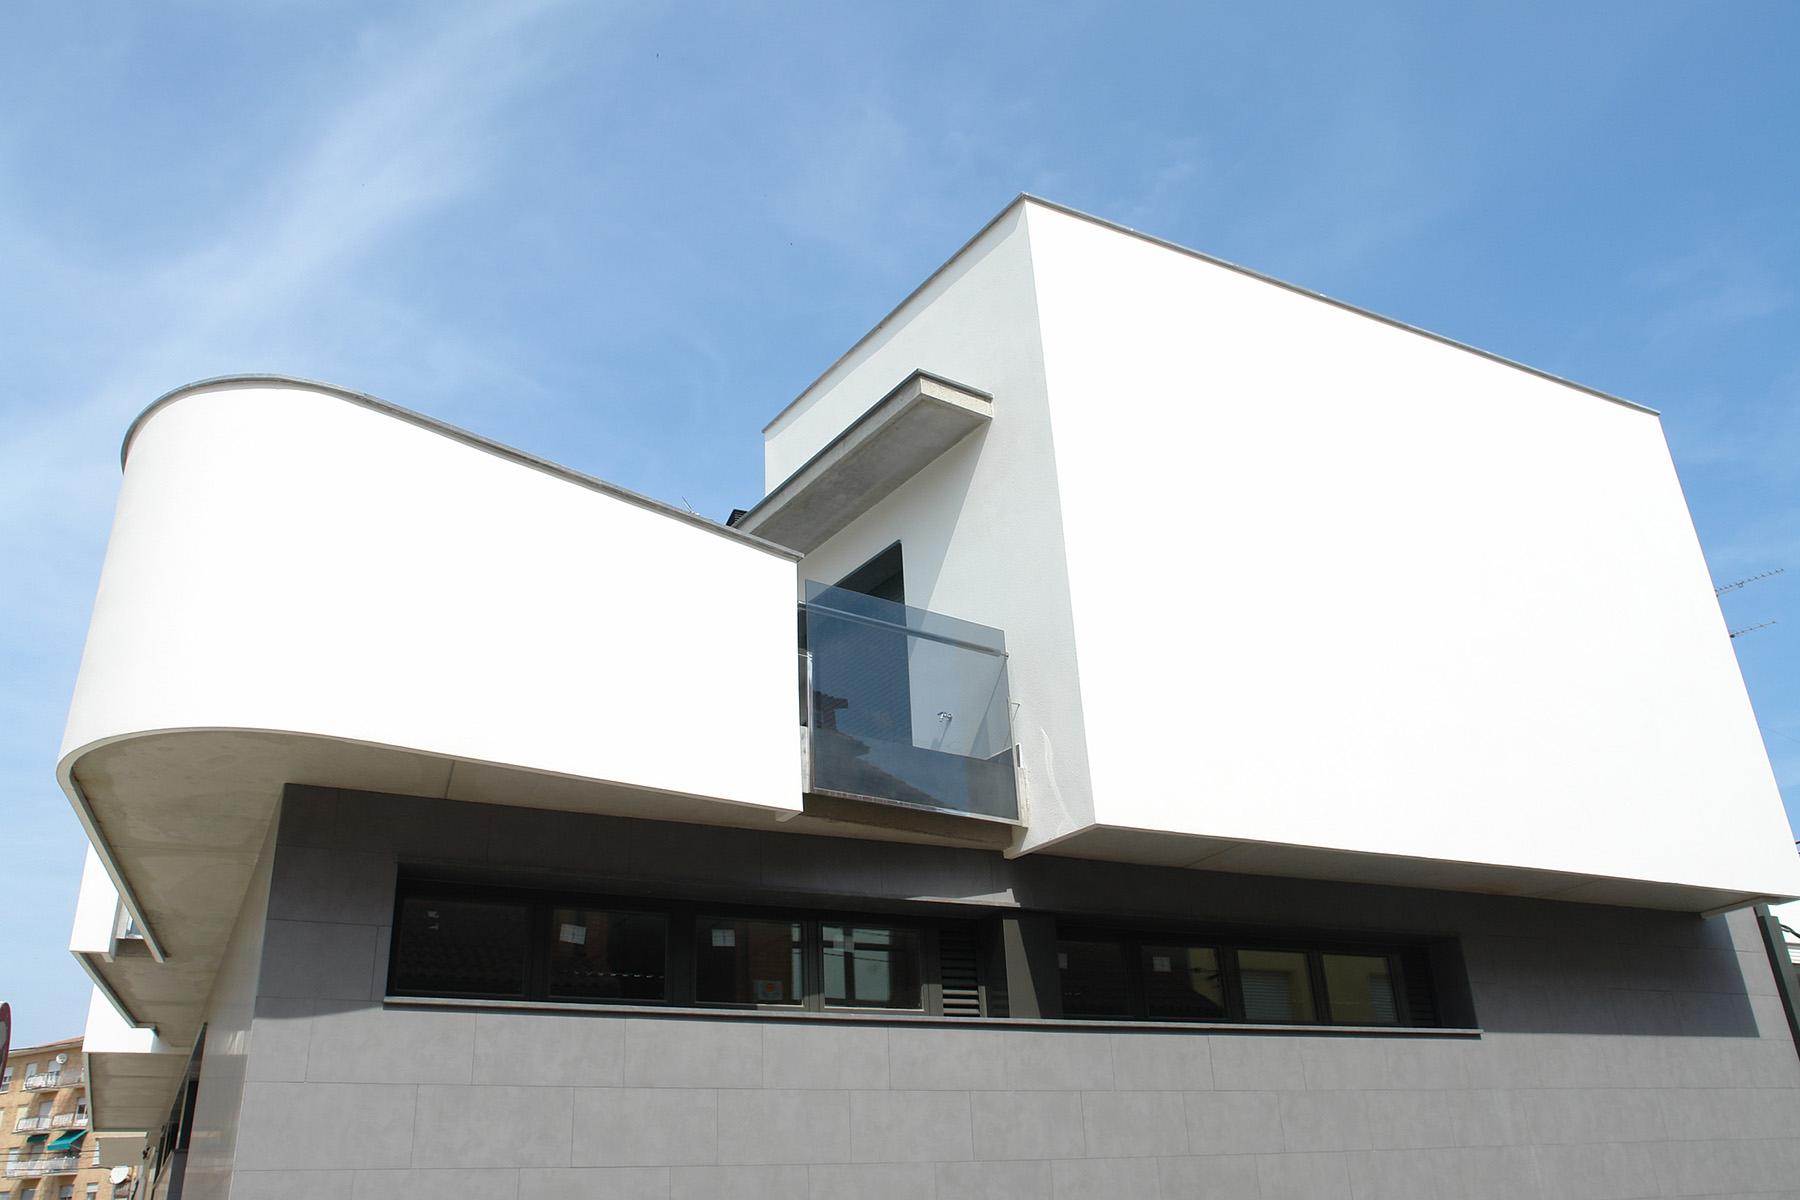 Galeria Casa en Binéfar, Huesca - 4 ?>